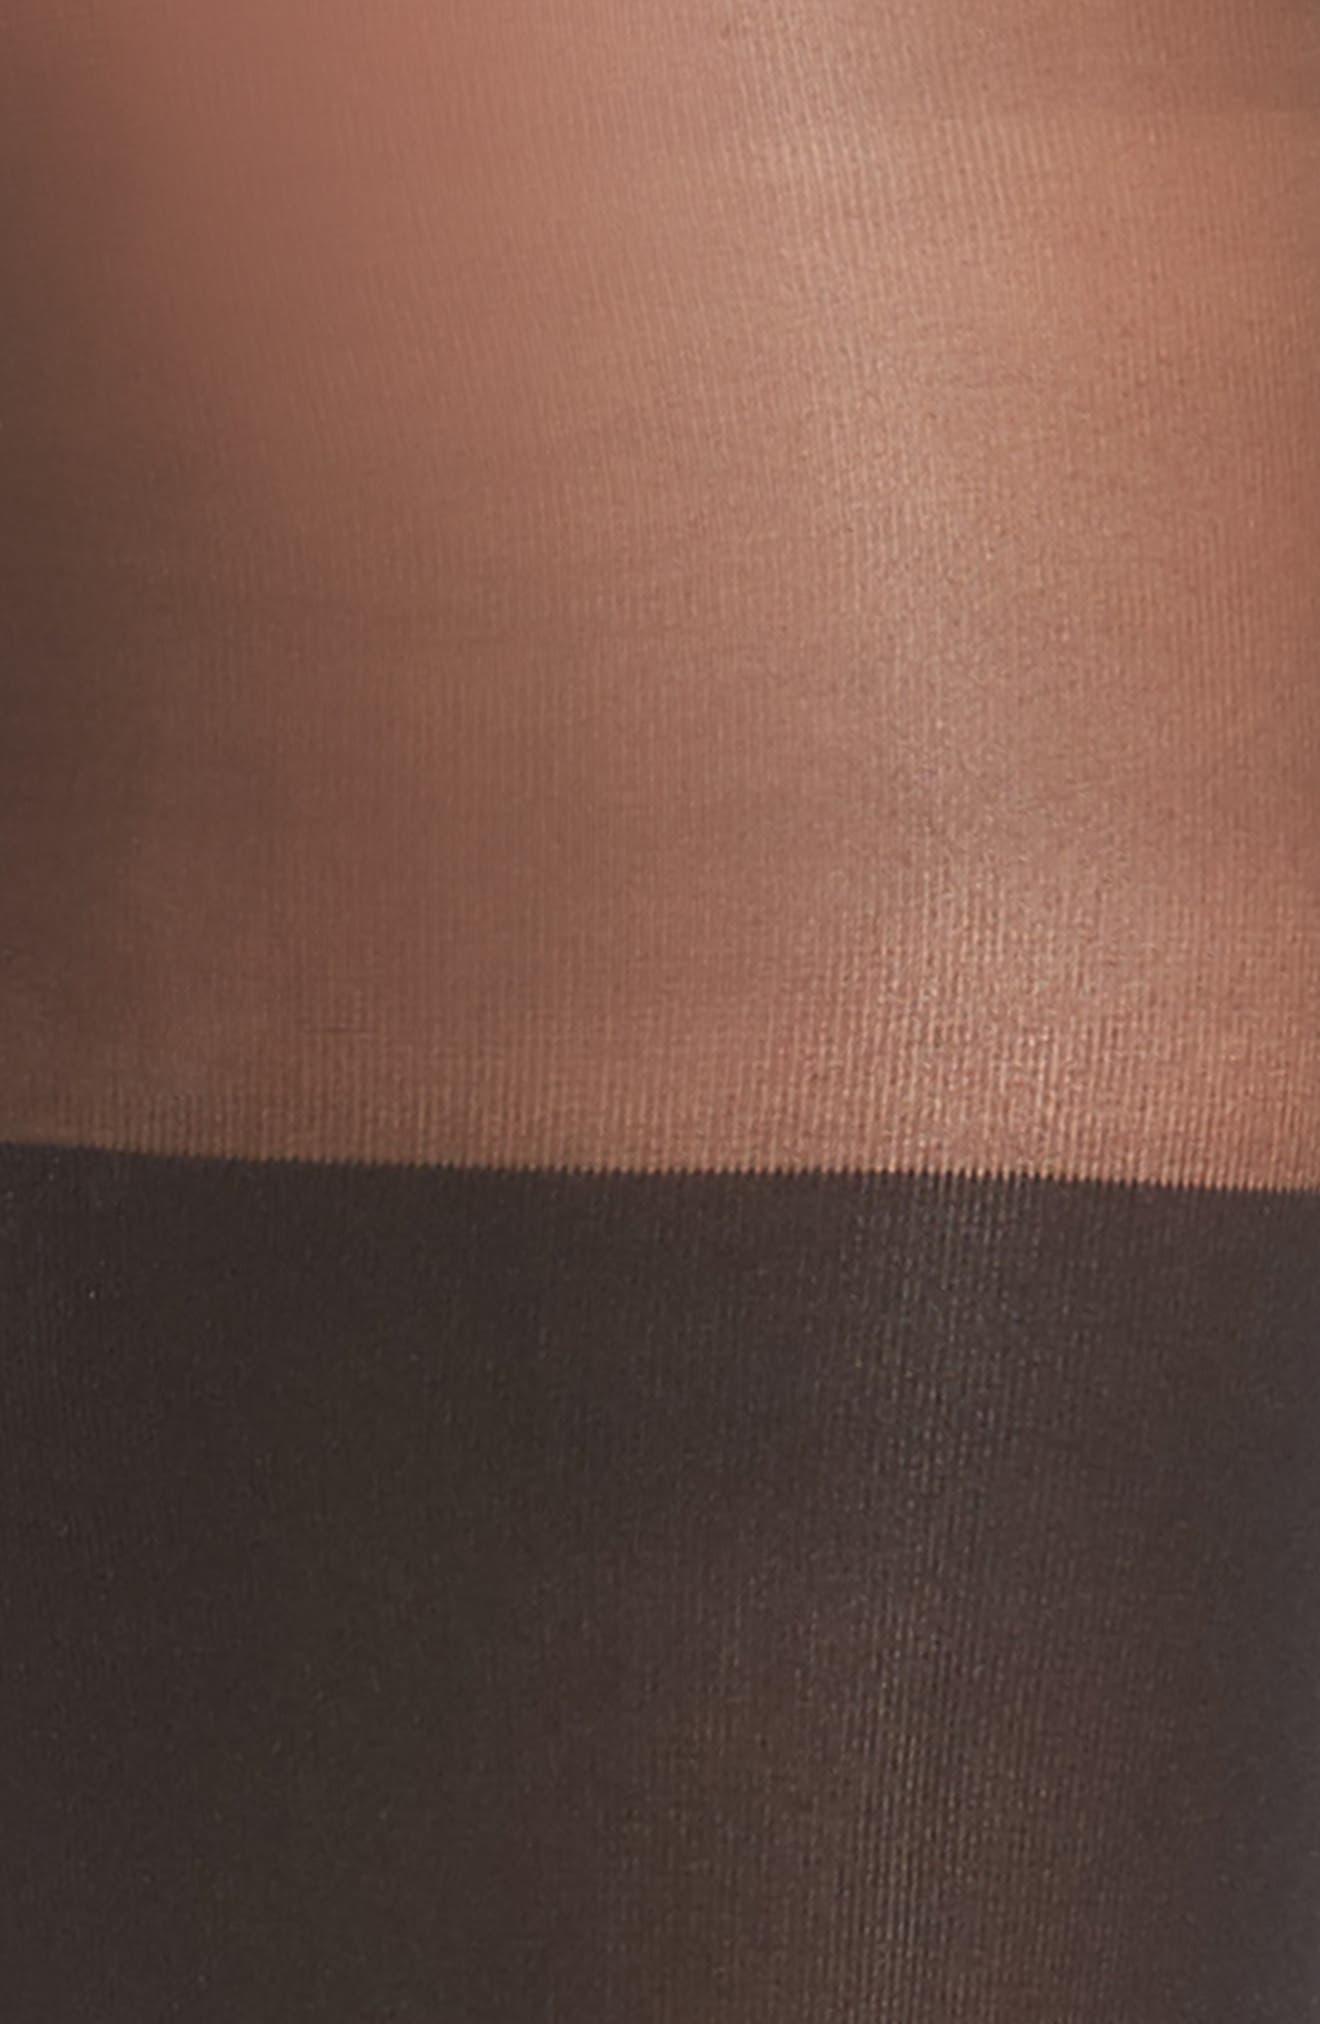 Alternate Image 2  - DKNY Illusion Thigh High Pantyhose